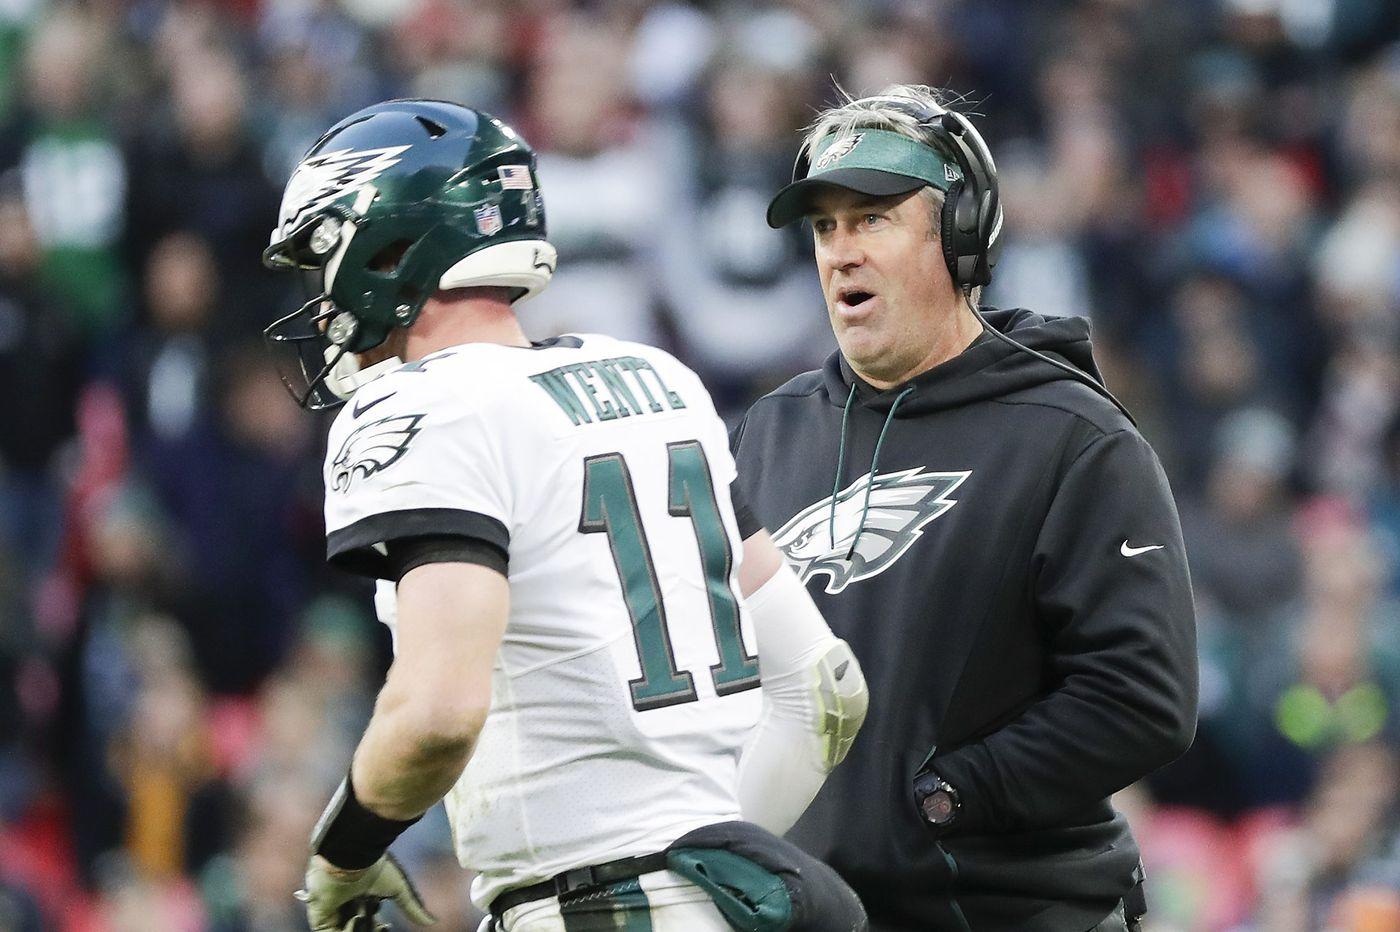 Eagles keep an open mind as trade deadline nears